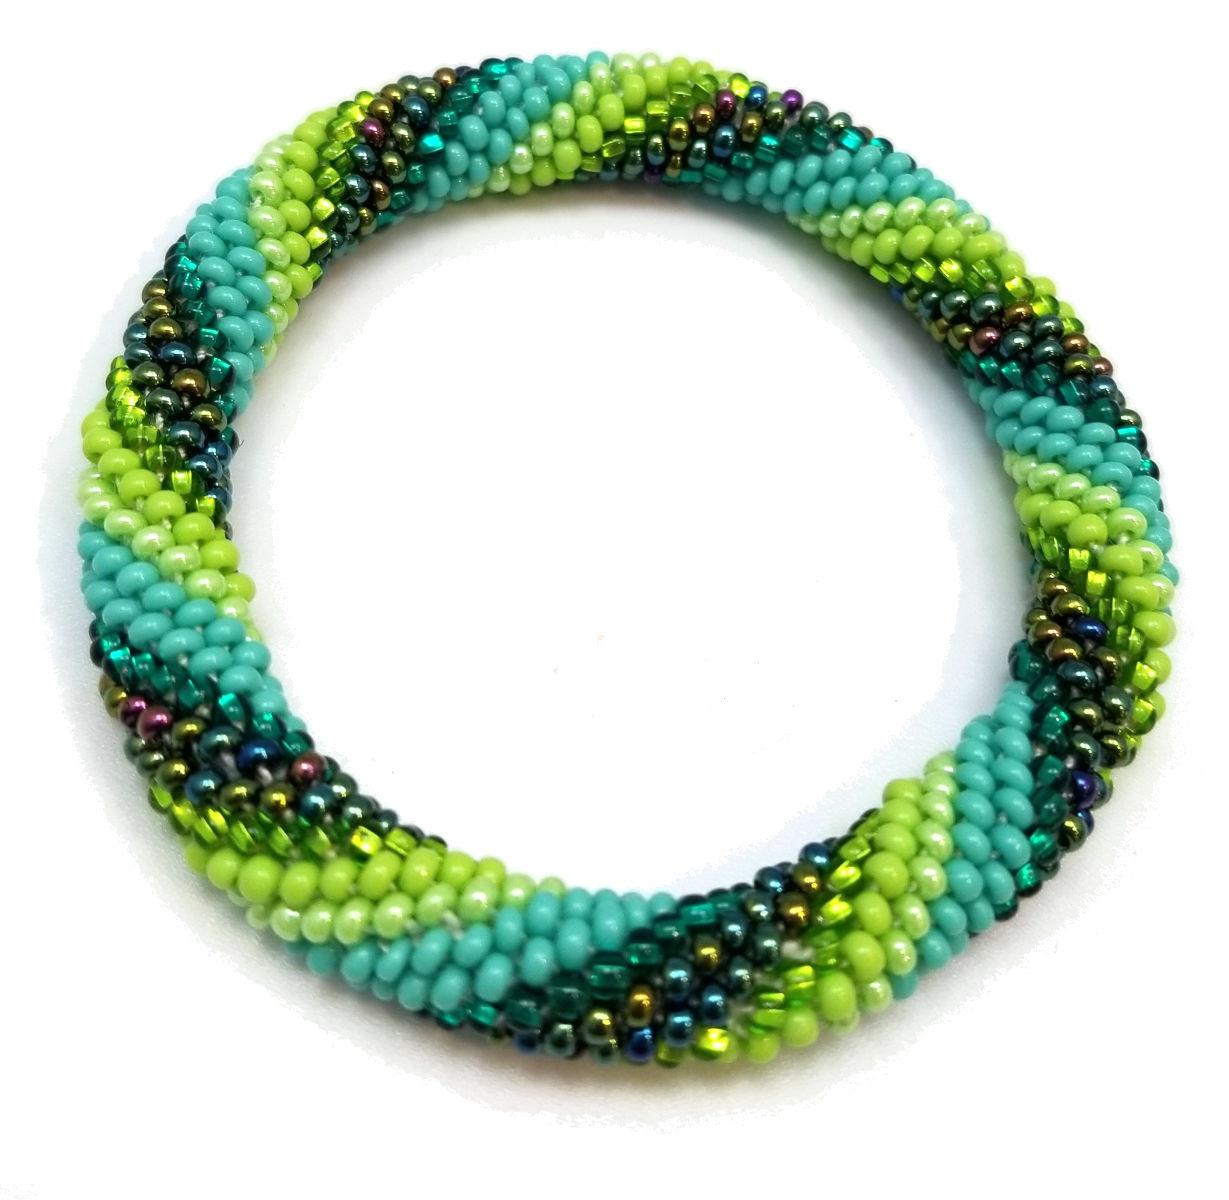 green Czech glass woven seed bead bracelet